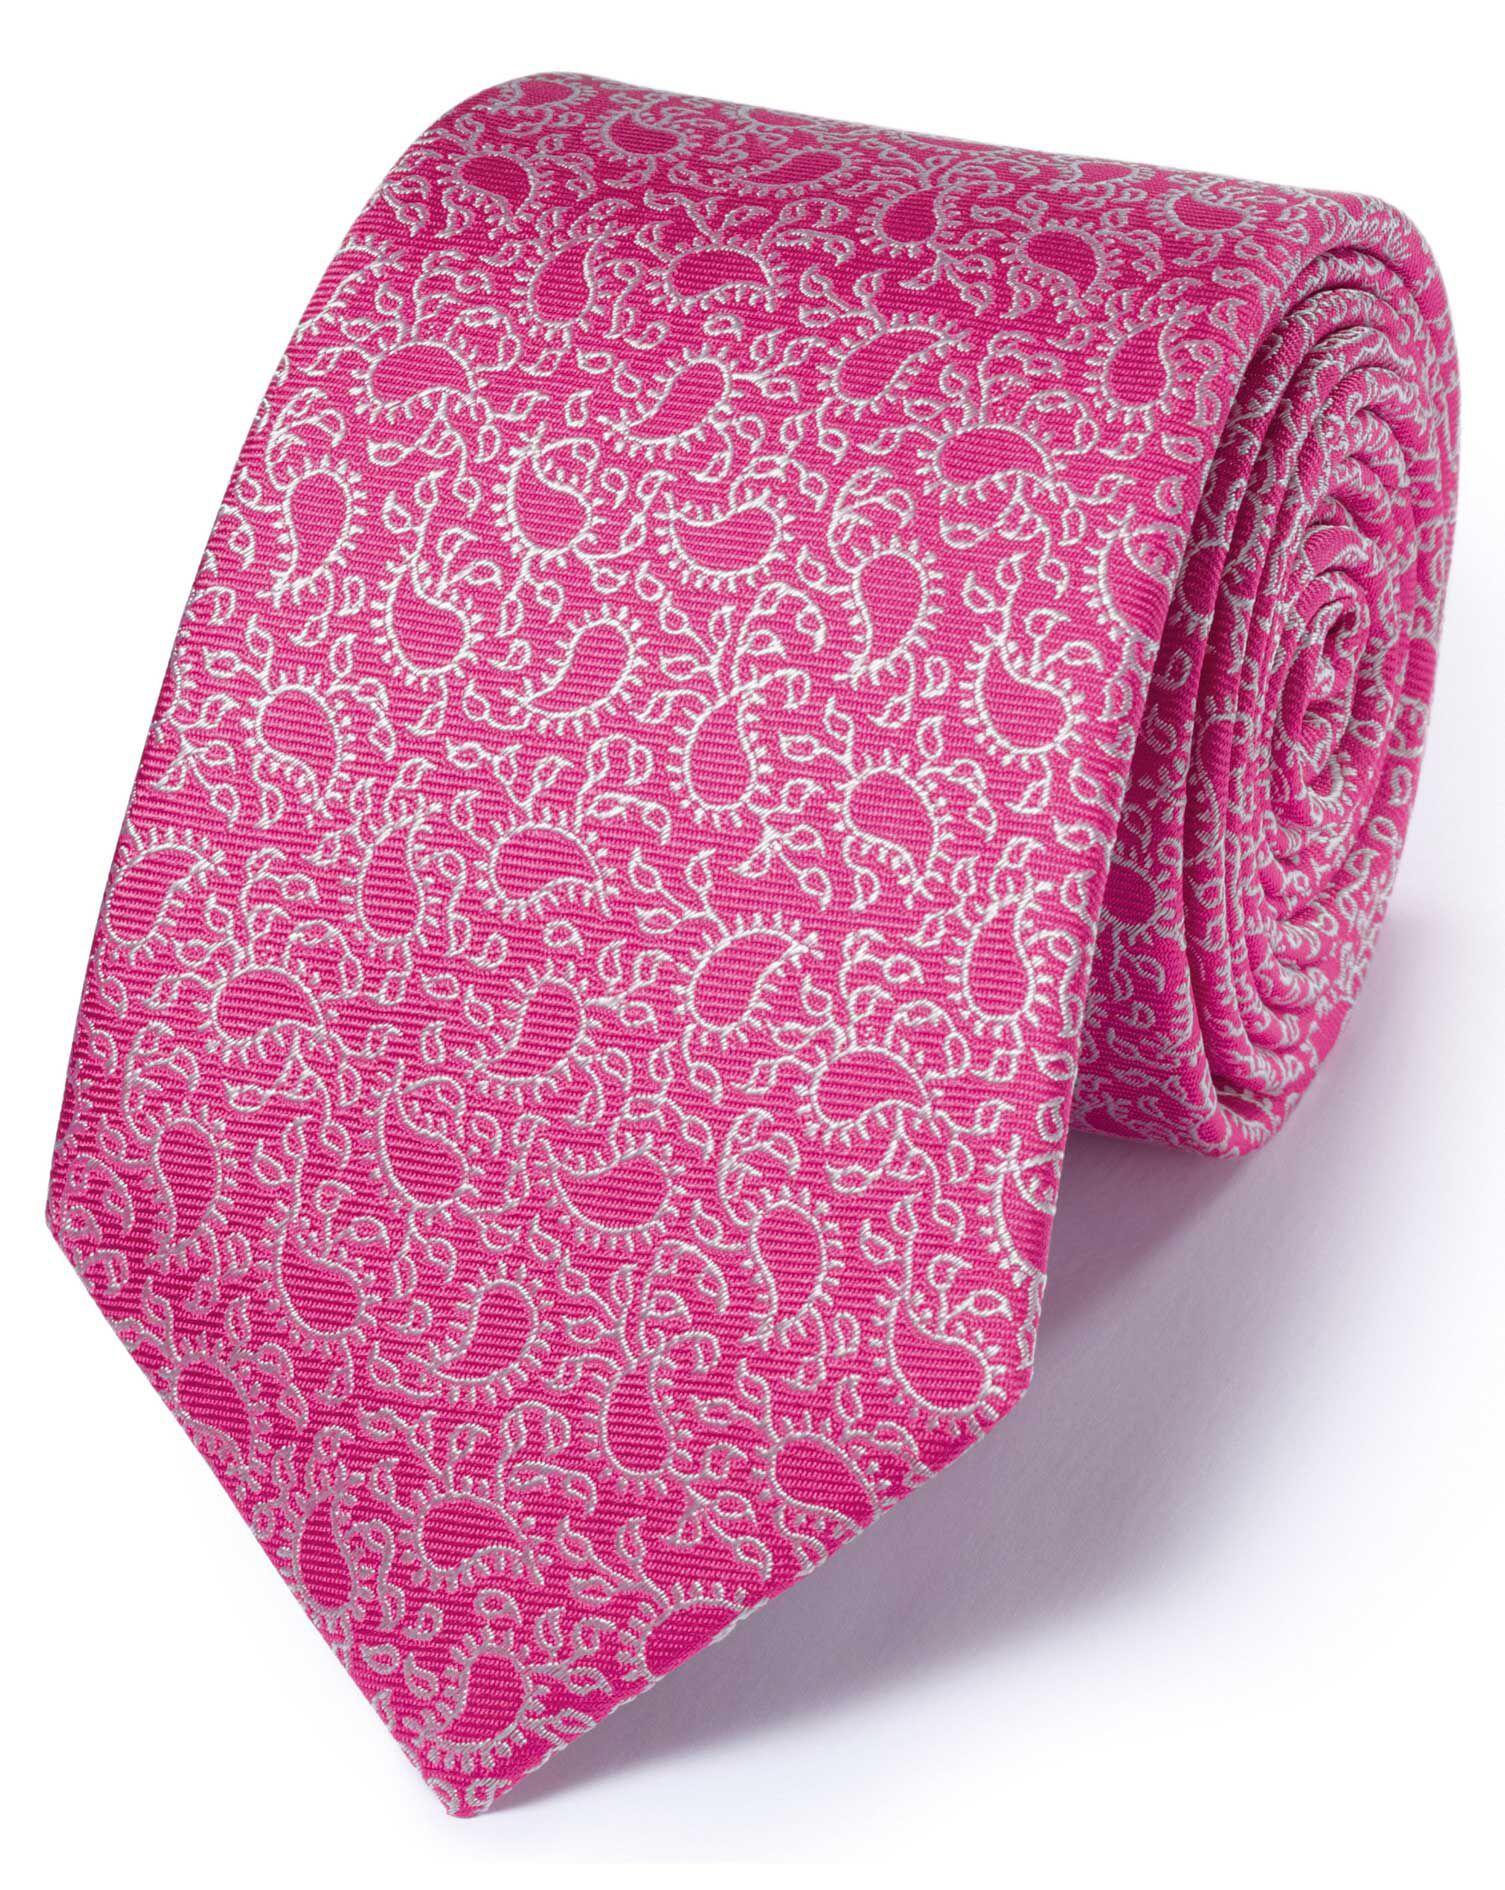 Dark Pink Silk Classic Paisley Tie Size OSFA by Charles Tyrwhitt